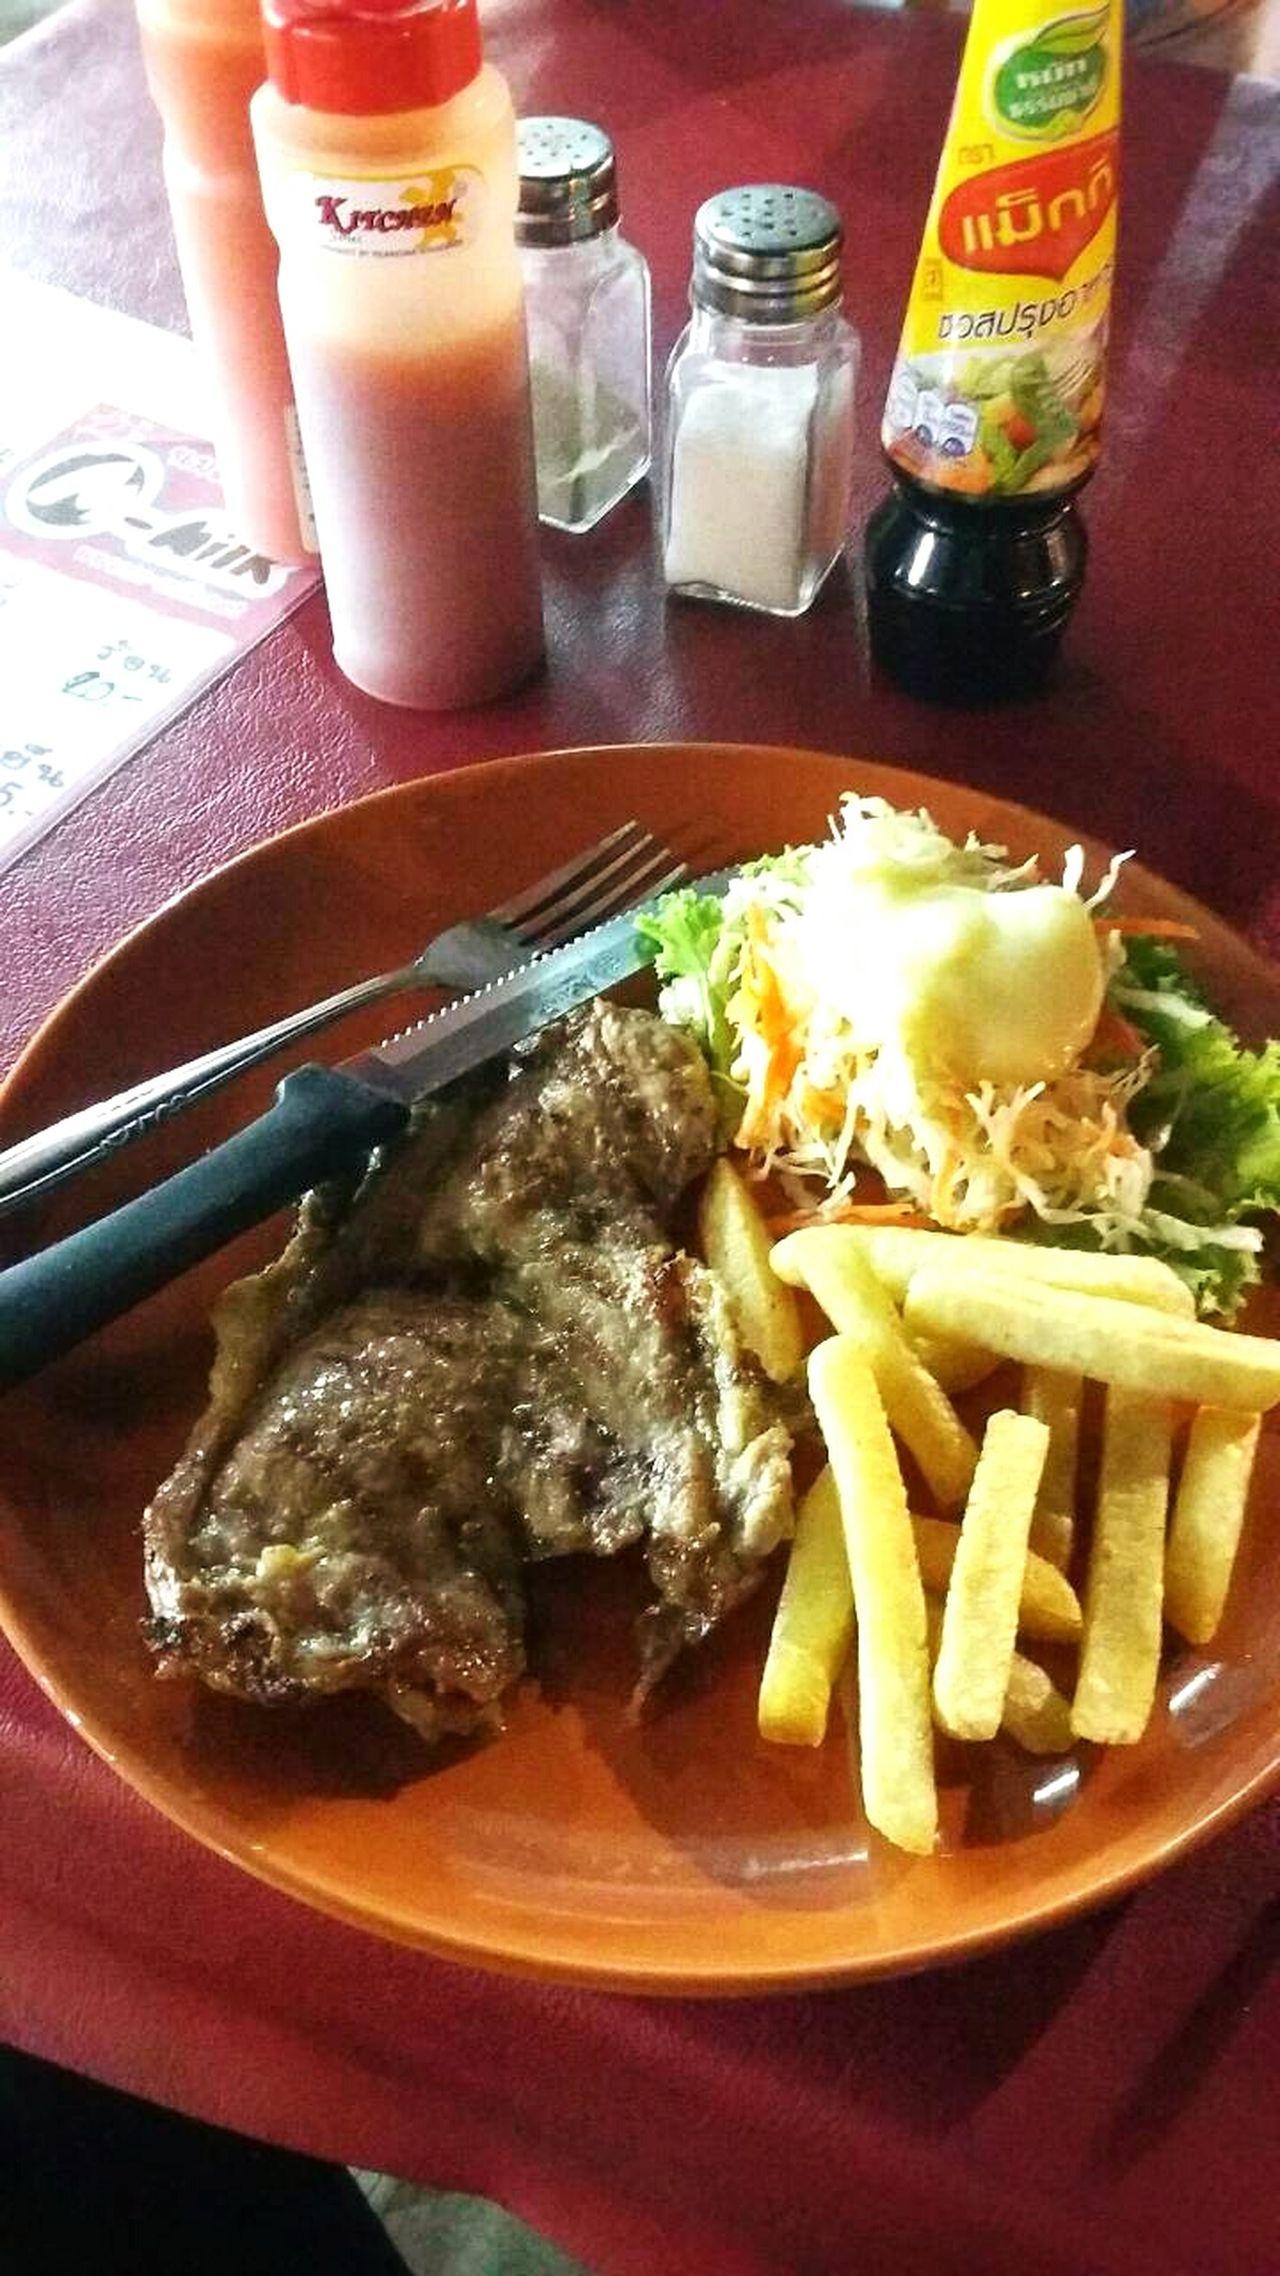 I luv pork steaks 😤😝😋 Pork Steaks French Fries Salad แม็กกี้ ซอสมะเขือเทศ Dish Fork Knife Pepper